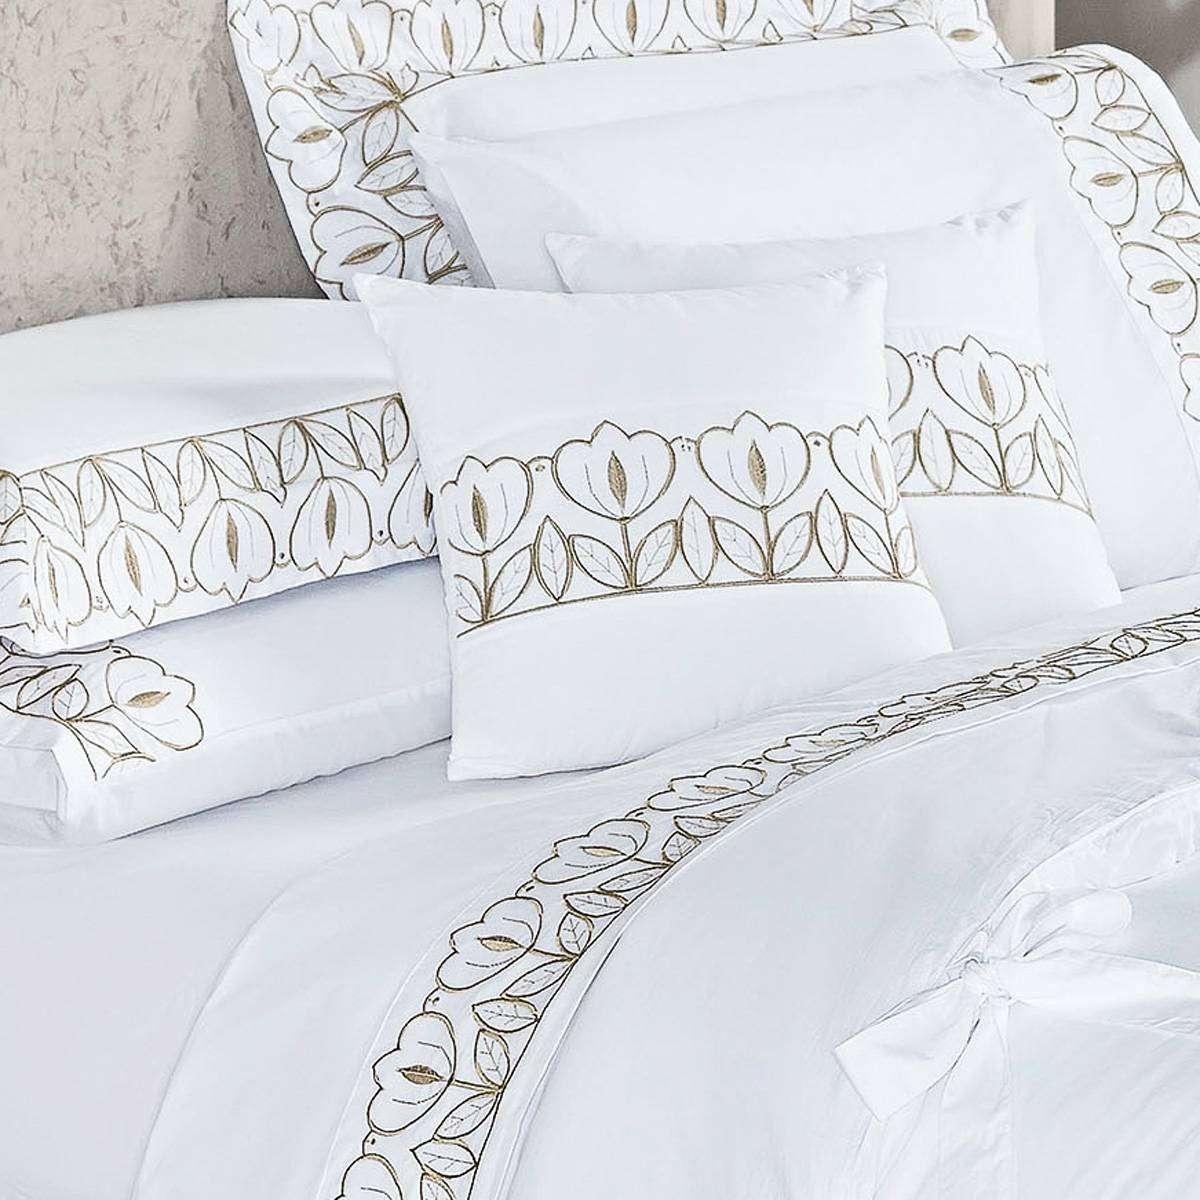 91a14b3fc3 Kit Edredom Casal Queen Bege Com Branco Almofada Decorativa 8 Peças